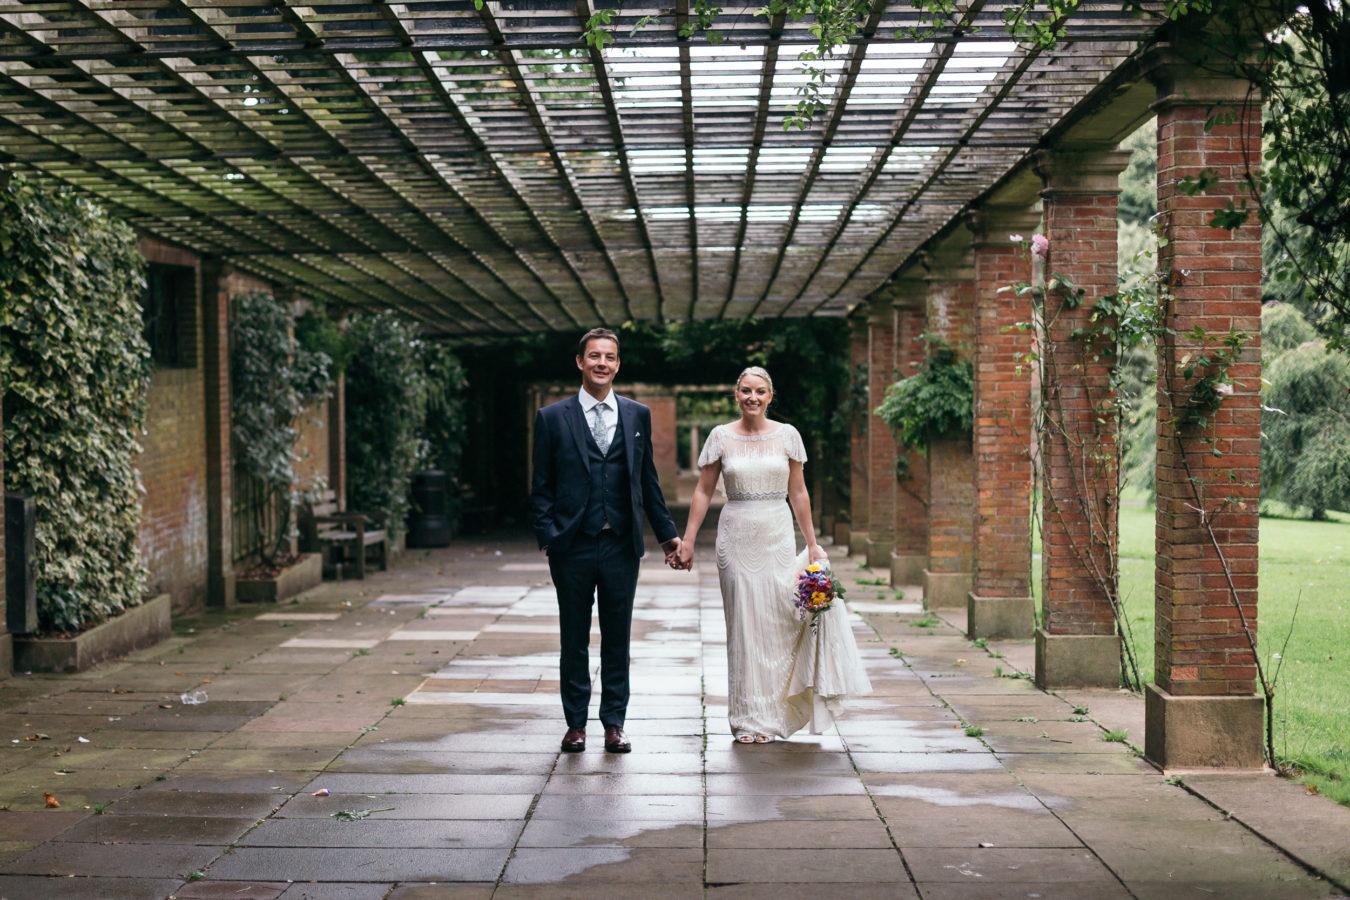 Sun Pavilion Harrogate wedding